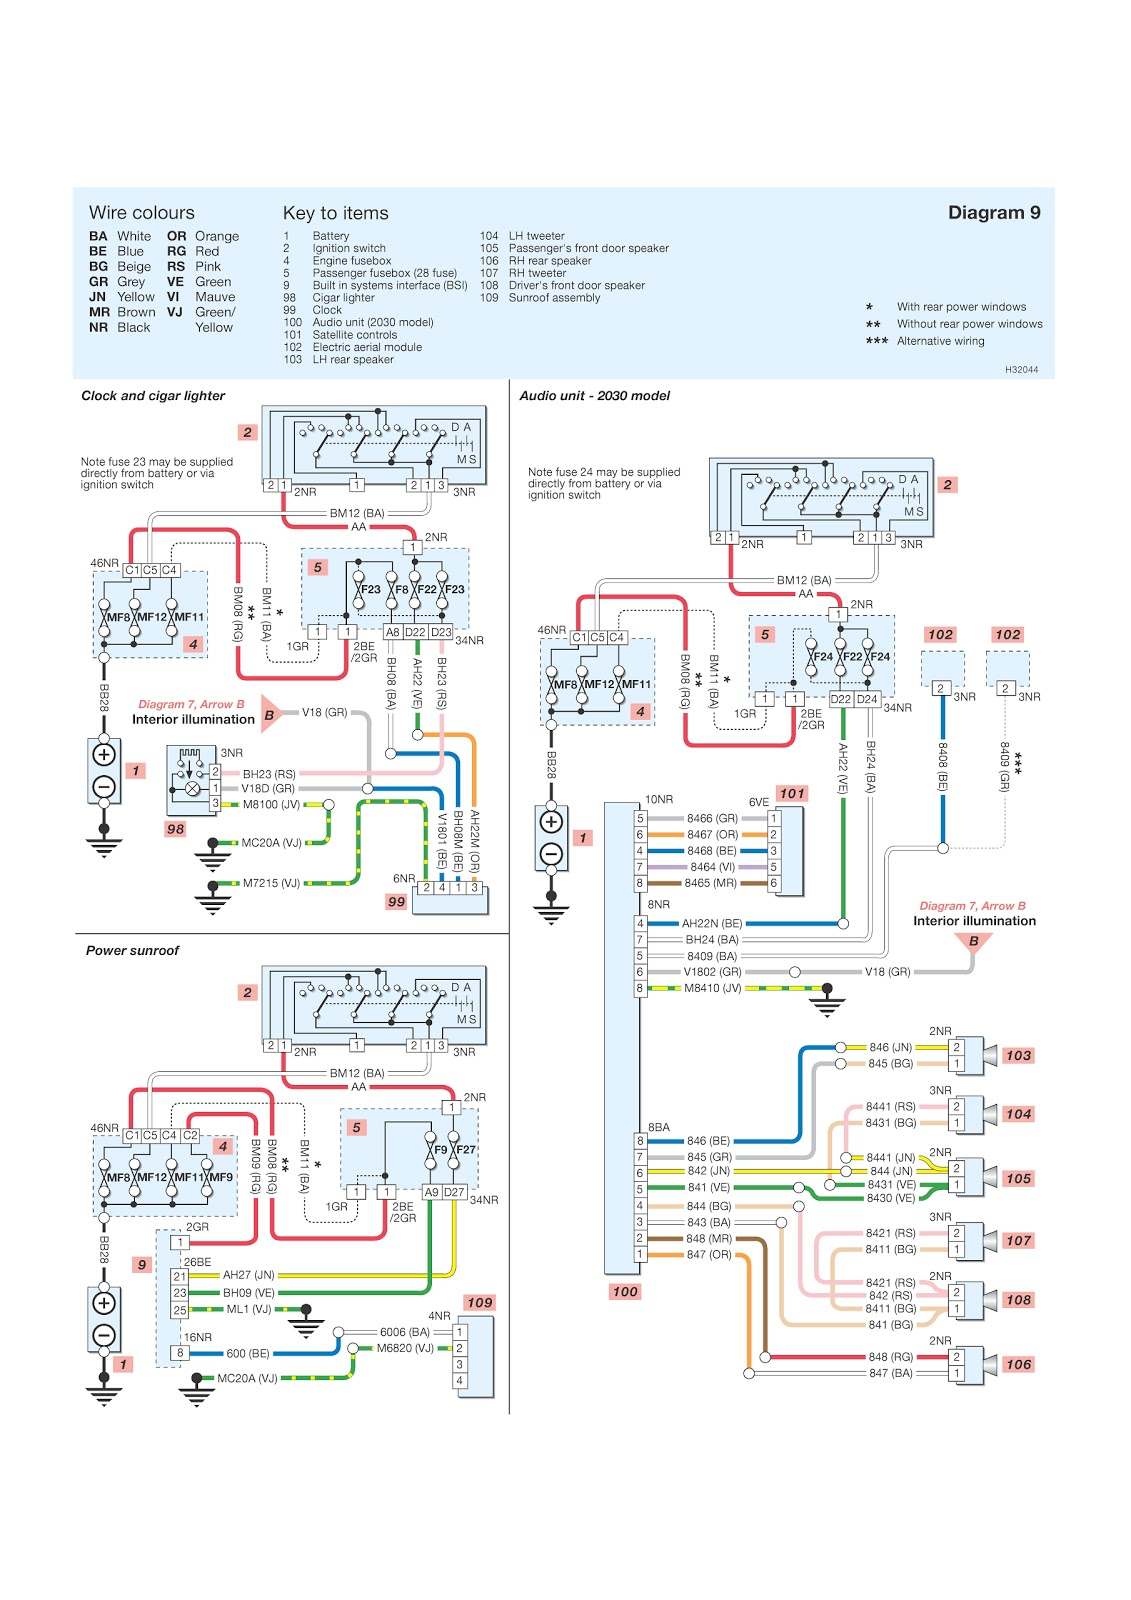 Rg Colorado Stereo Wiring Diagram Lambretta With Indicators Peugeot 206 System Diagrams Clock Cigar Lighter